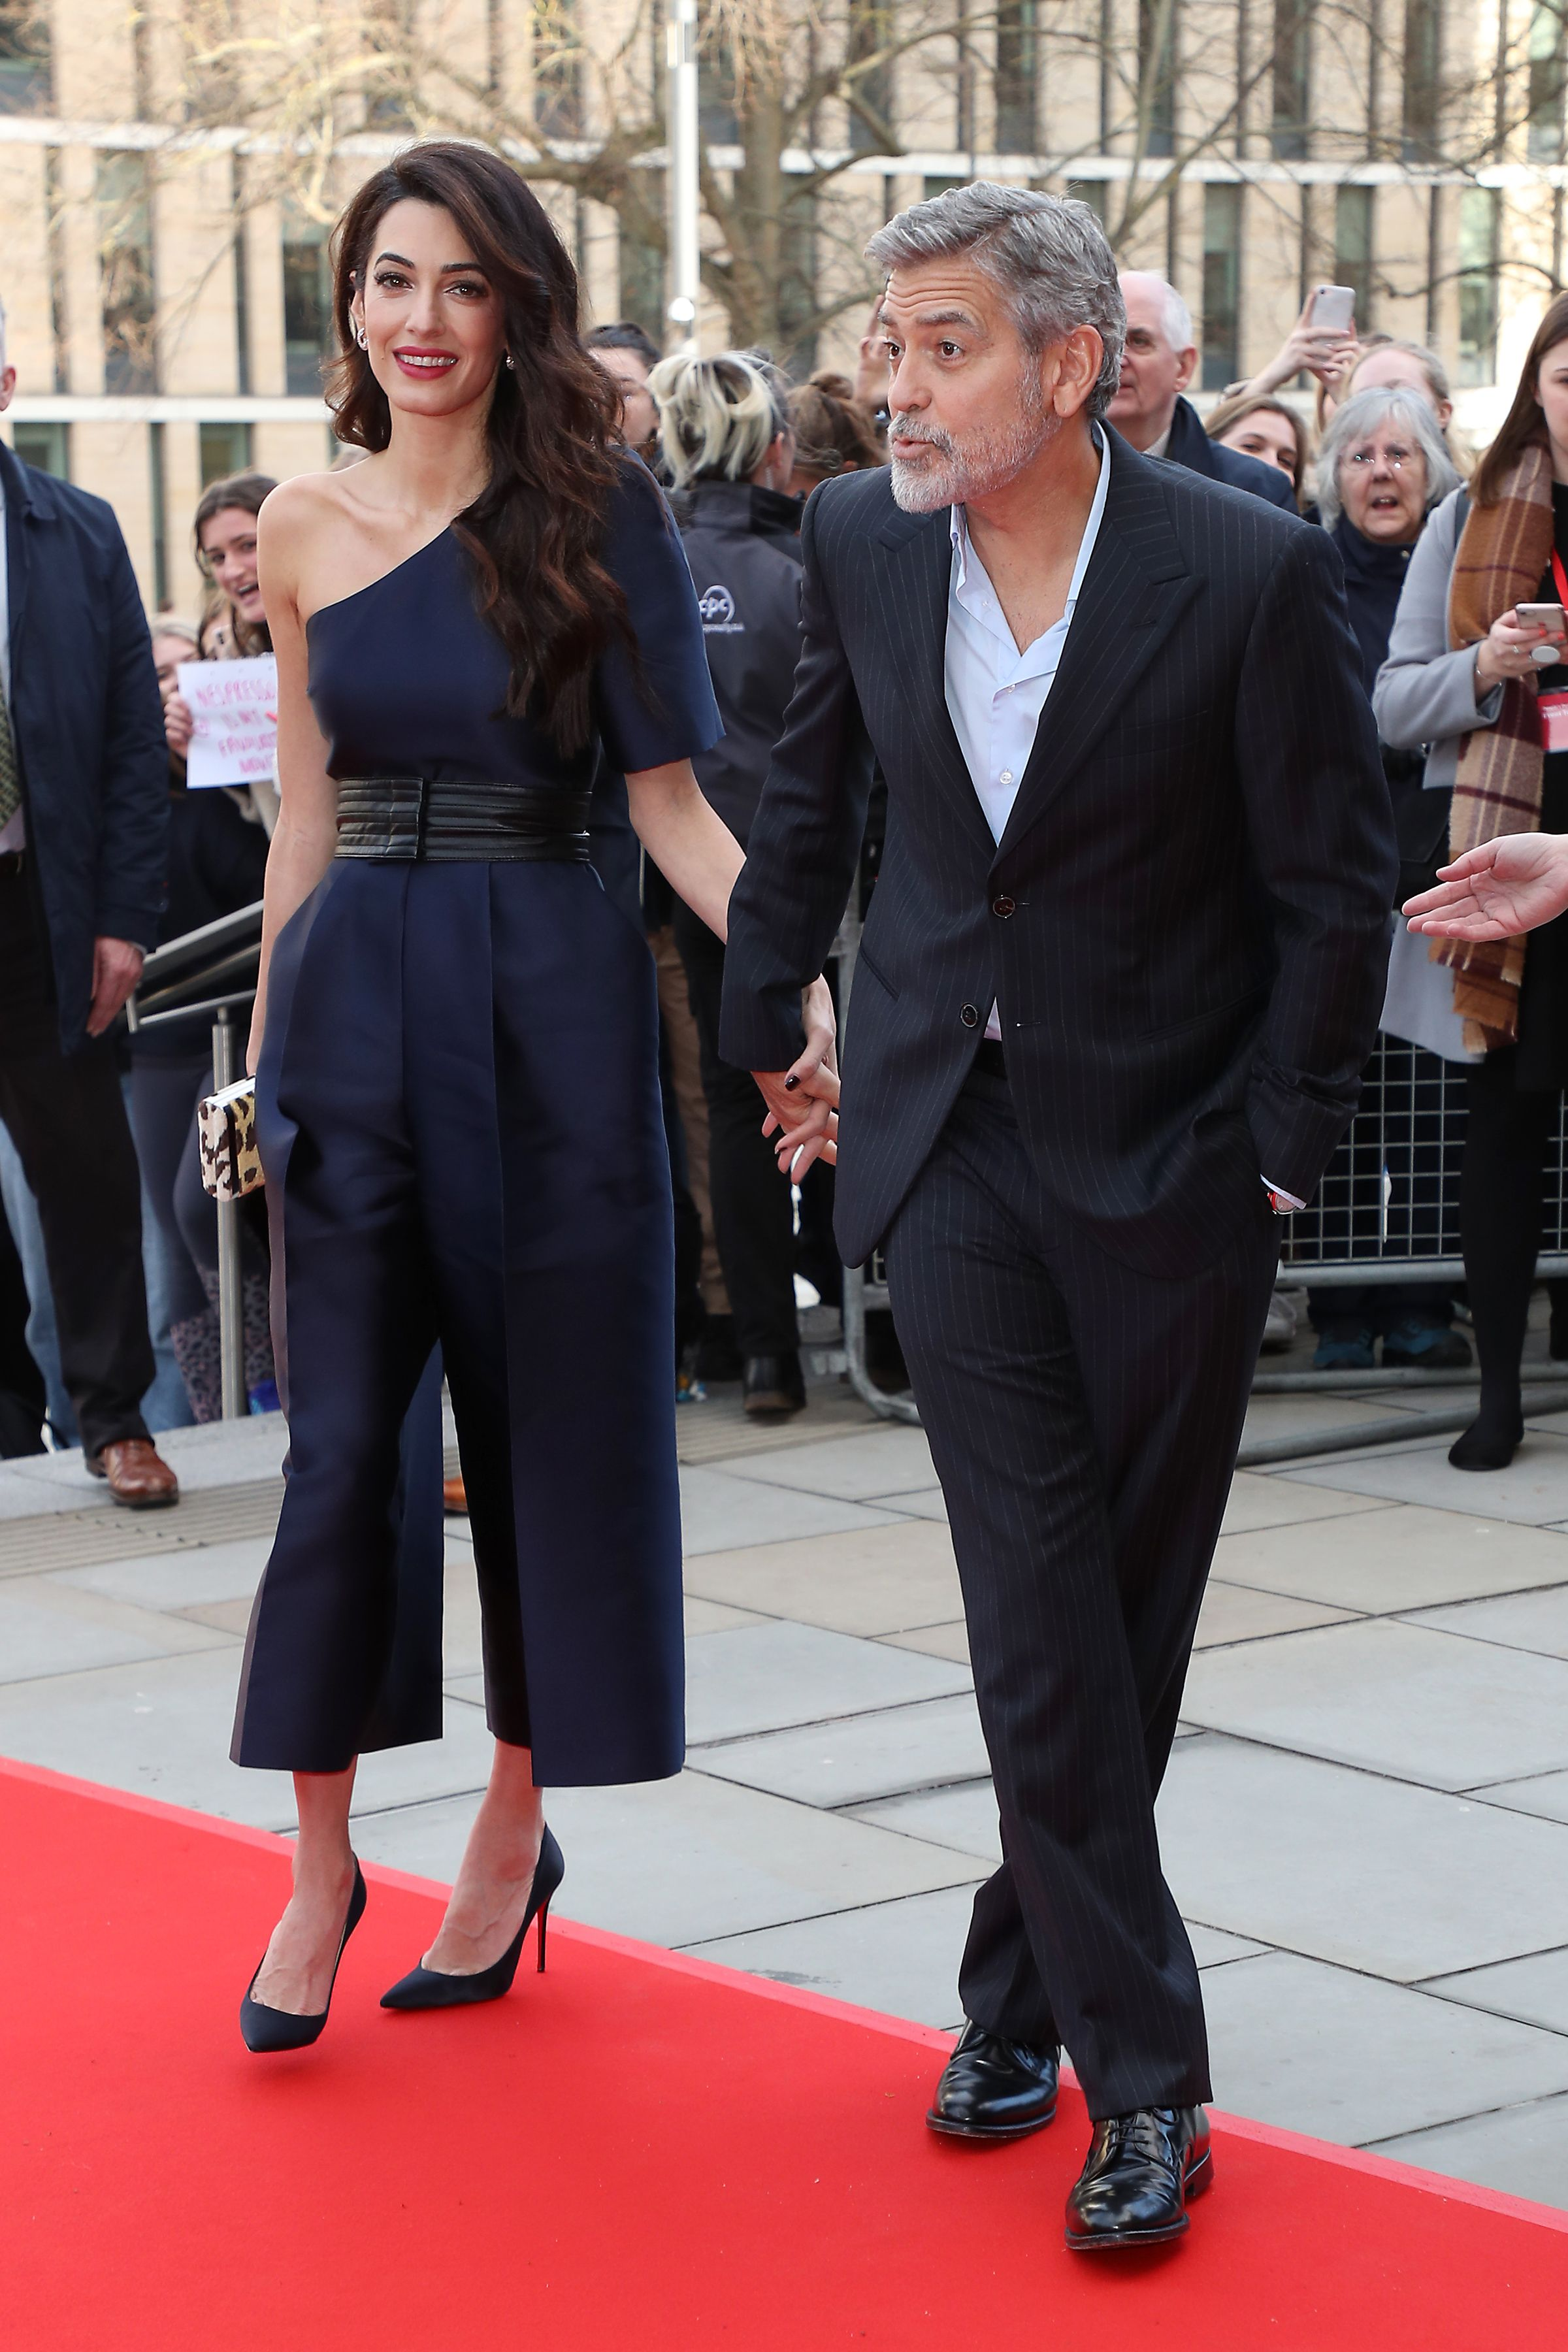 Amal Clooney Best Style Moments - Amal Clooney Fashion Photos